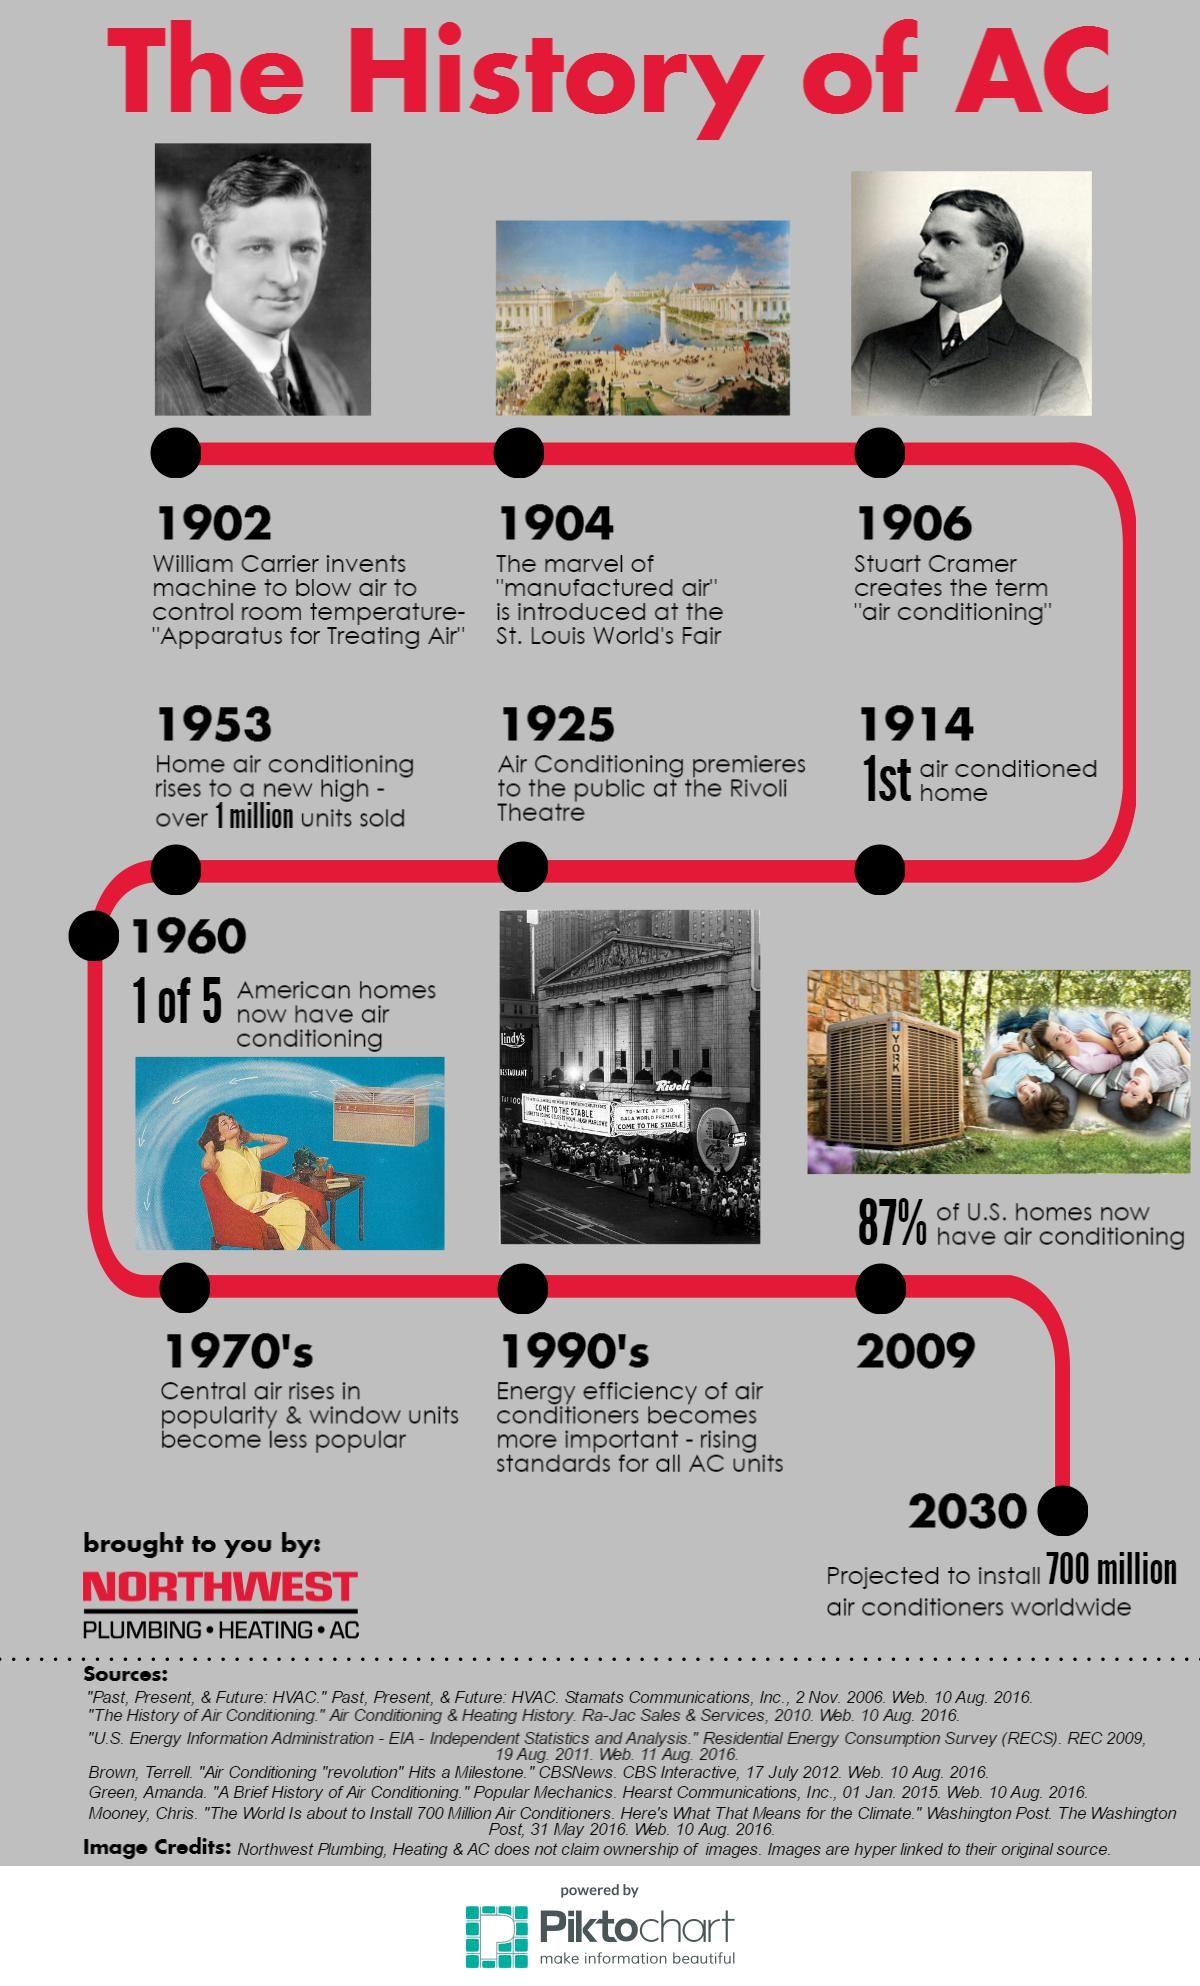 History Of Ac Timeline Http Www Callnw Com Resources Blog